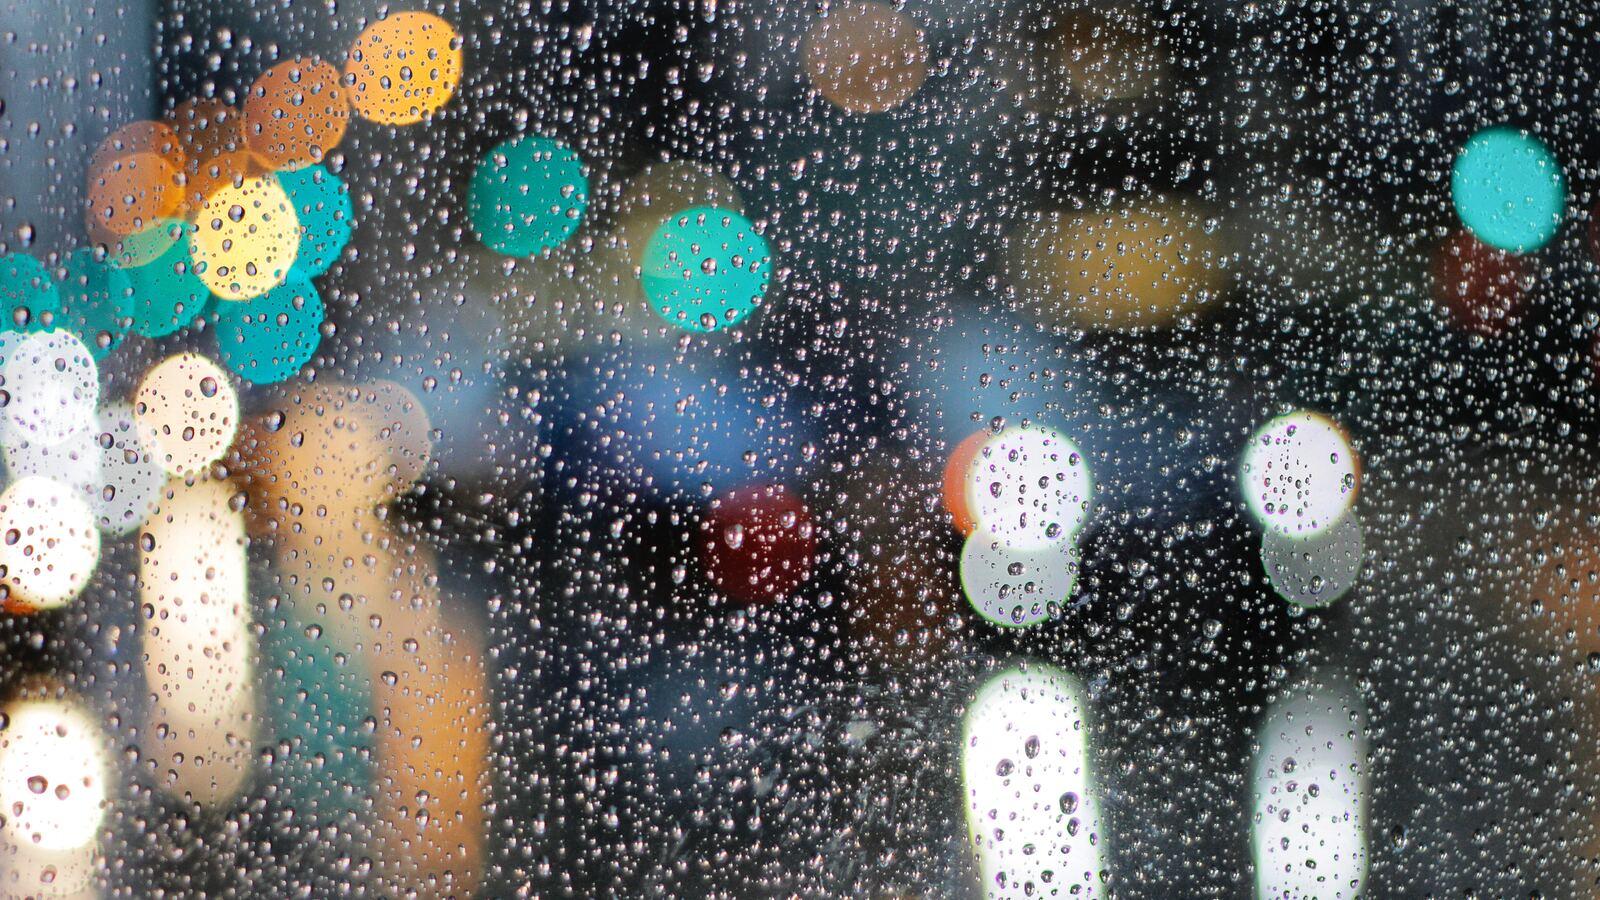 https://images.hdqwalls.com/download/rainy-day-drops-on-glass-lights-bokeh-5k-1m-1600x900.jpg